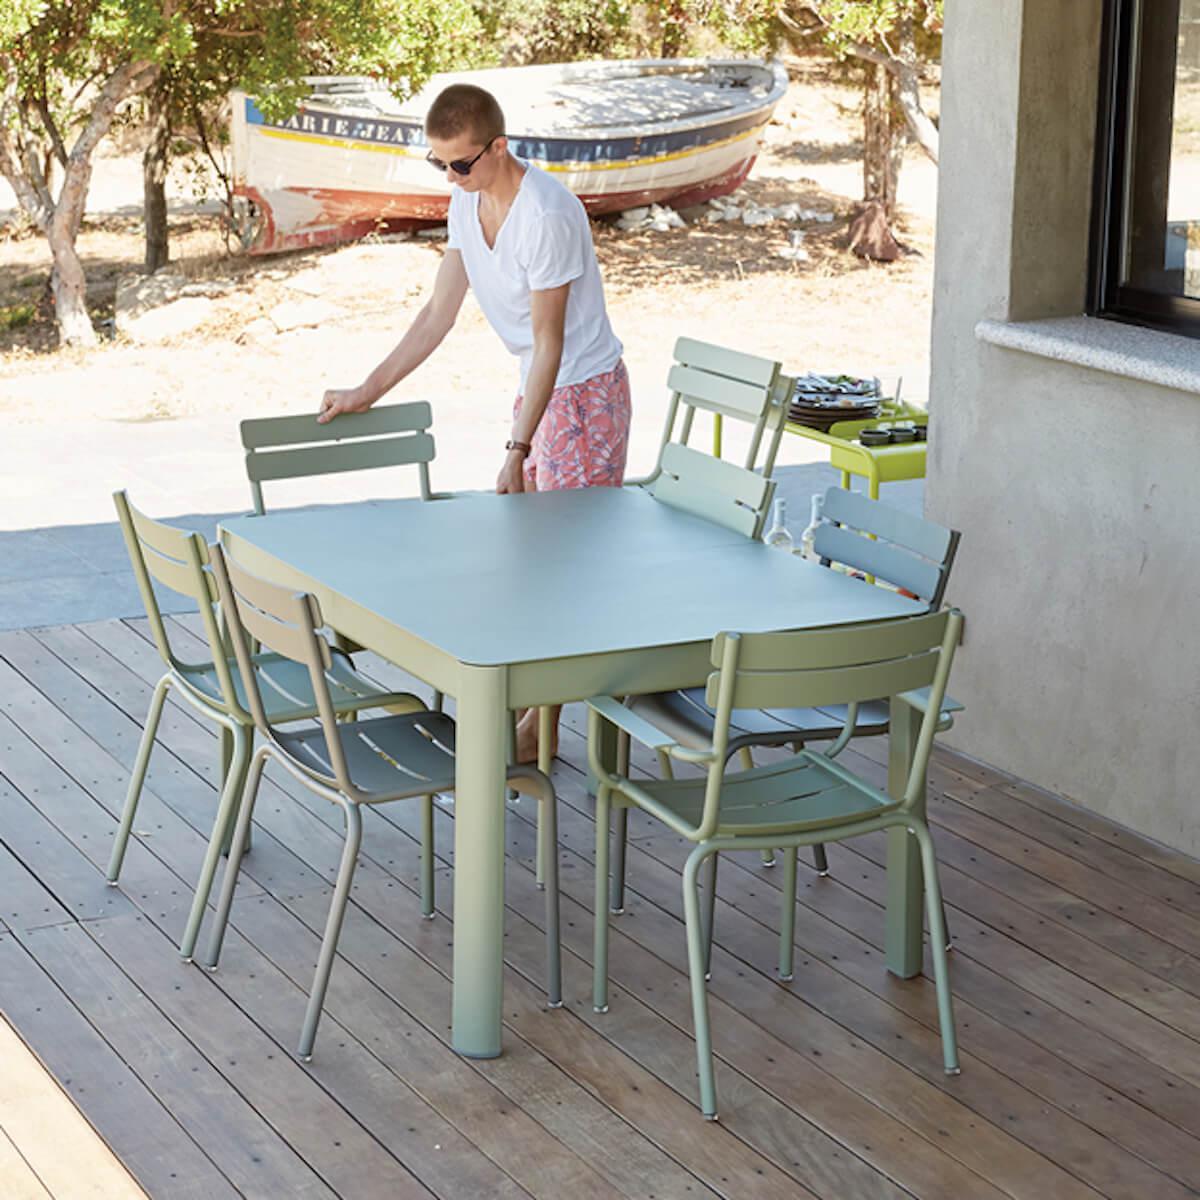 Table à rallonge 149/191x100cm RIBAMBELLE Fermob vert opaline